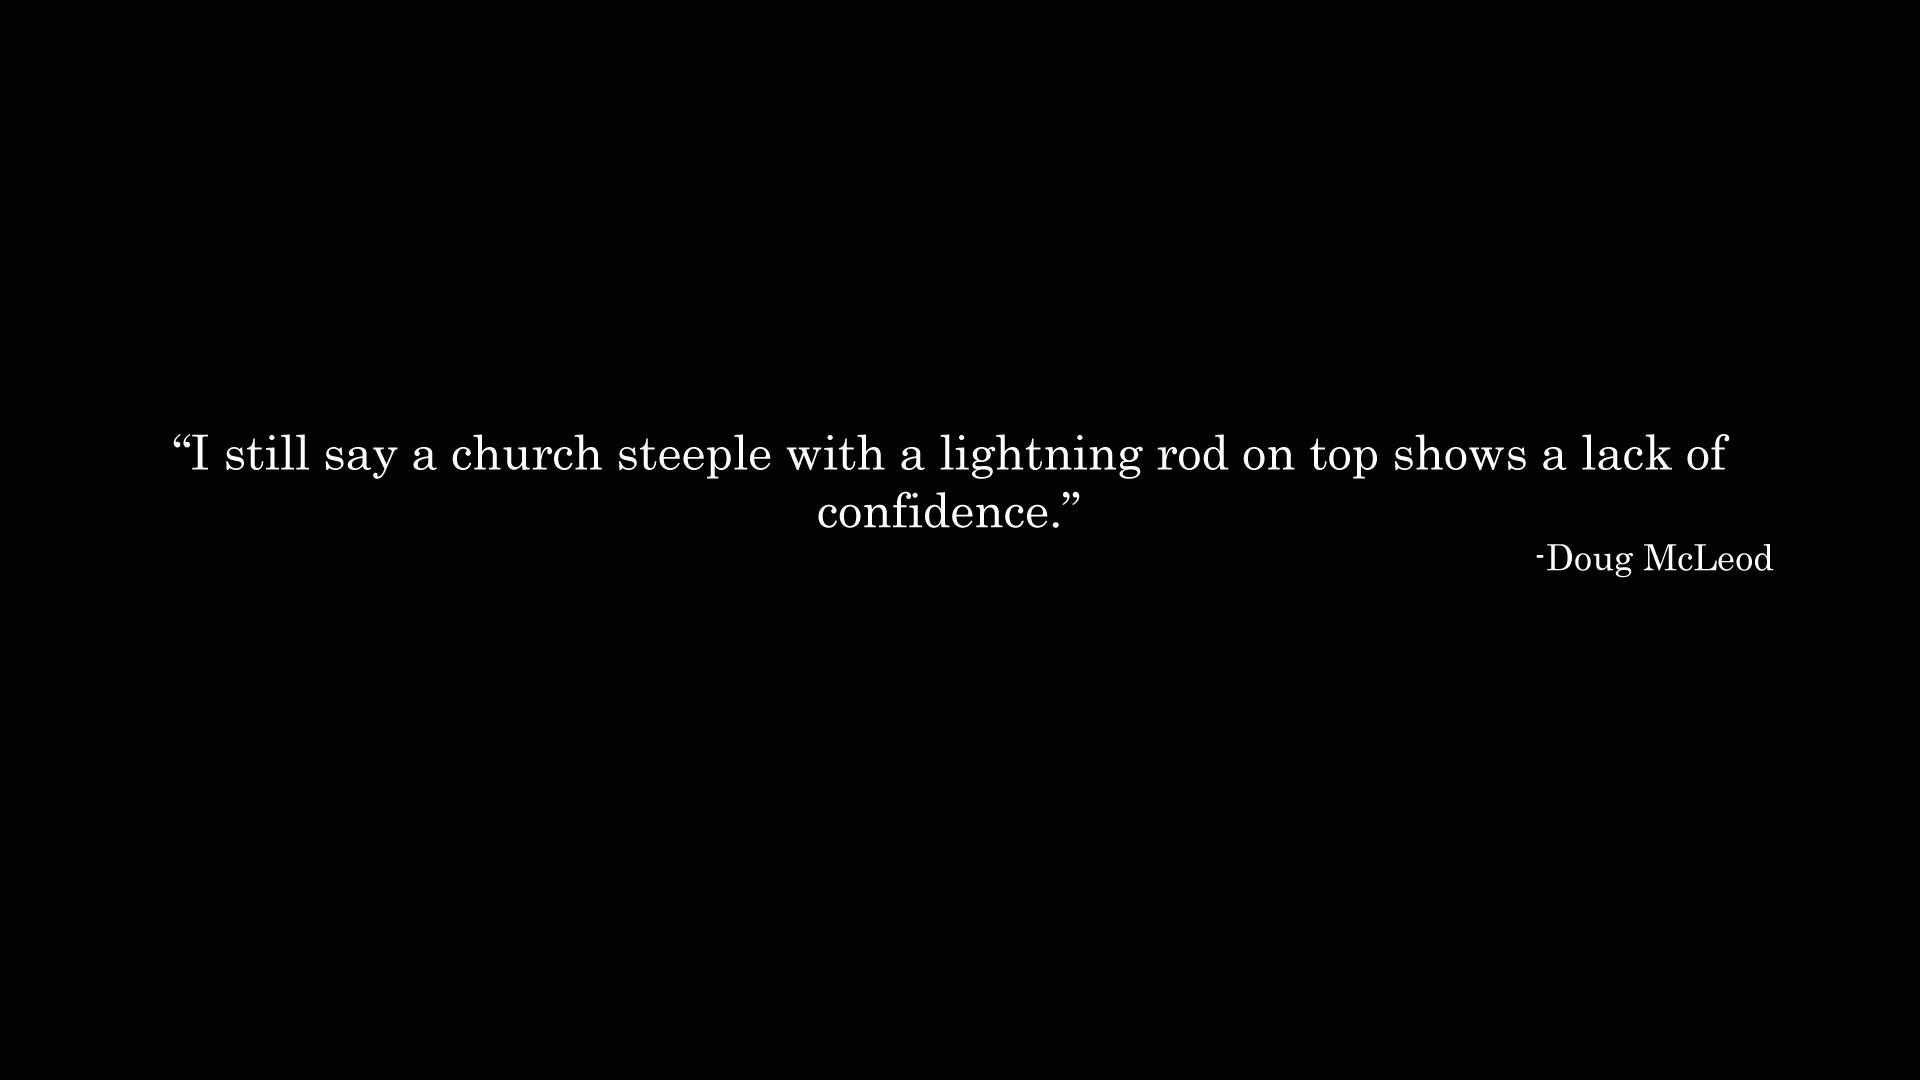 McLeod BW Black Atheist Church Steeple text humor wallpaper background 1920x1080